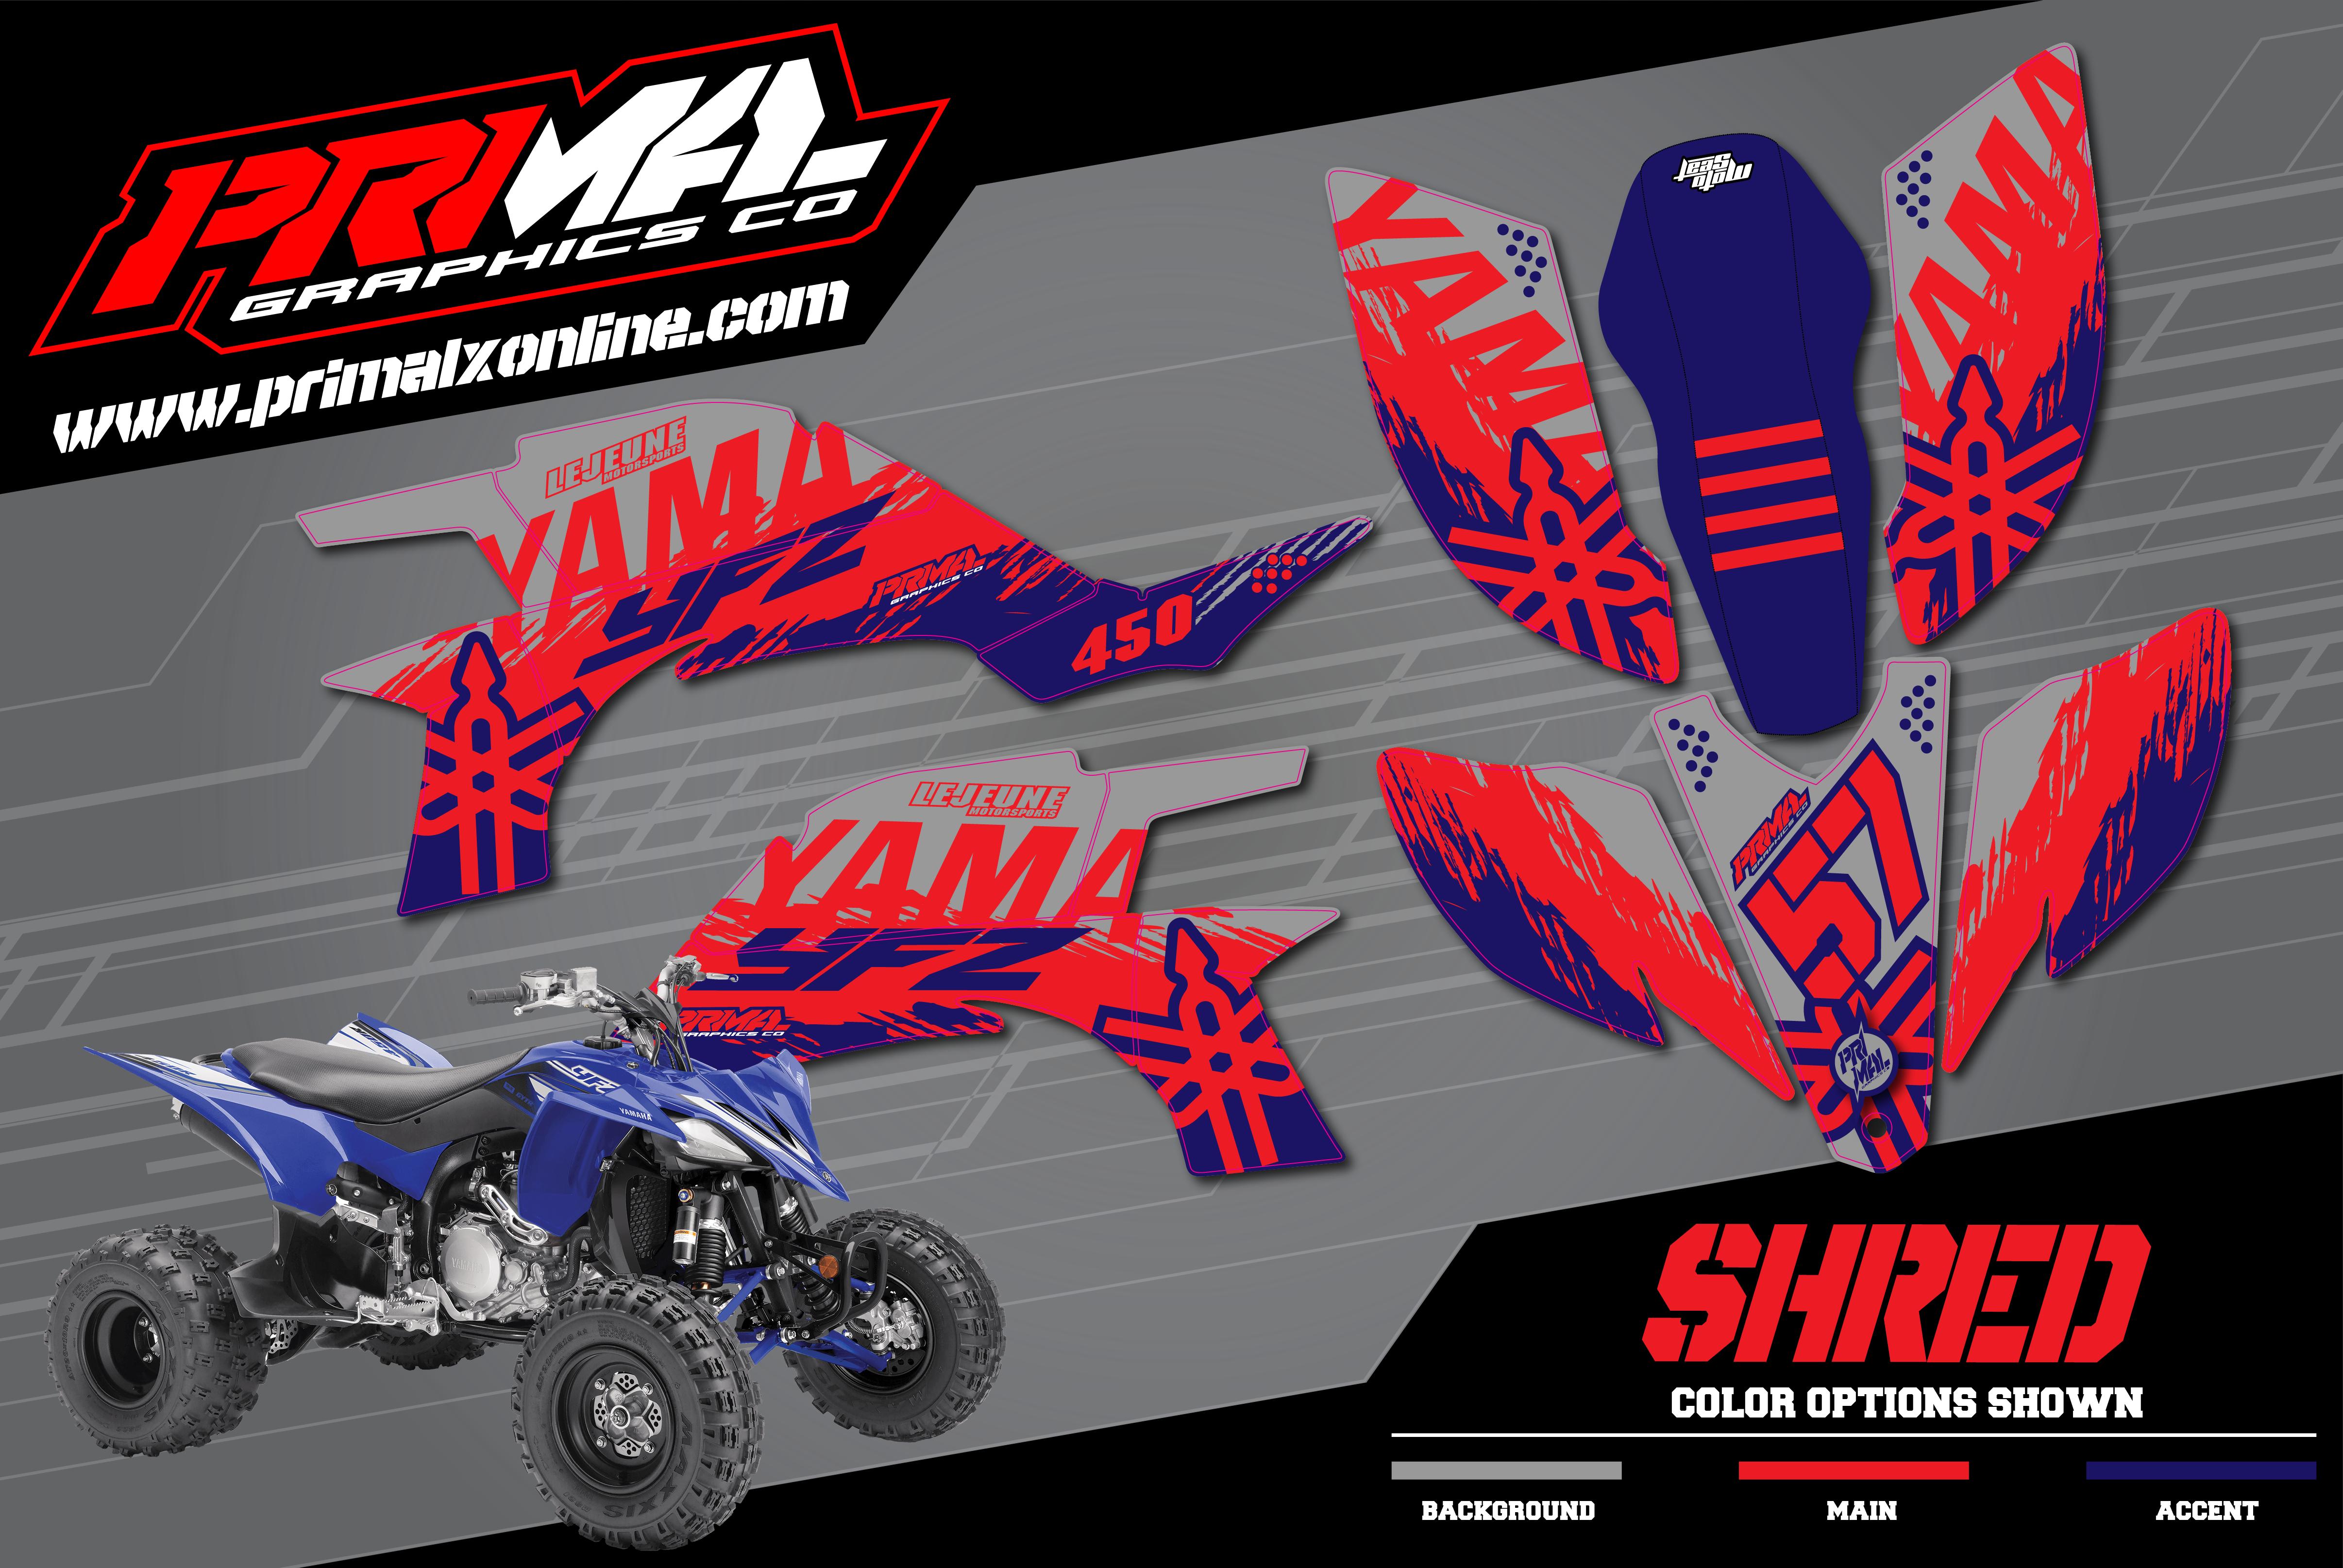 PRIMAL-X-MOTORSPORTS-PRIMAL-GRAPHICS-CO-YAMAHA-YFZ450-YFZ-ATV-GRAPHICS-MX-GRAPHICS-MX-DECALS-QUAD-GRAPHICS-01